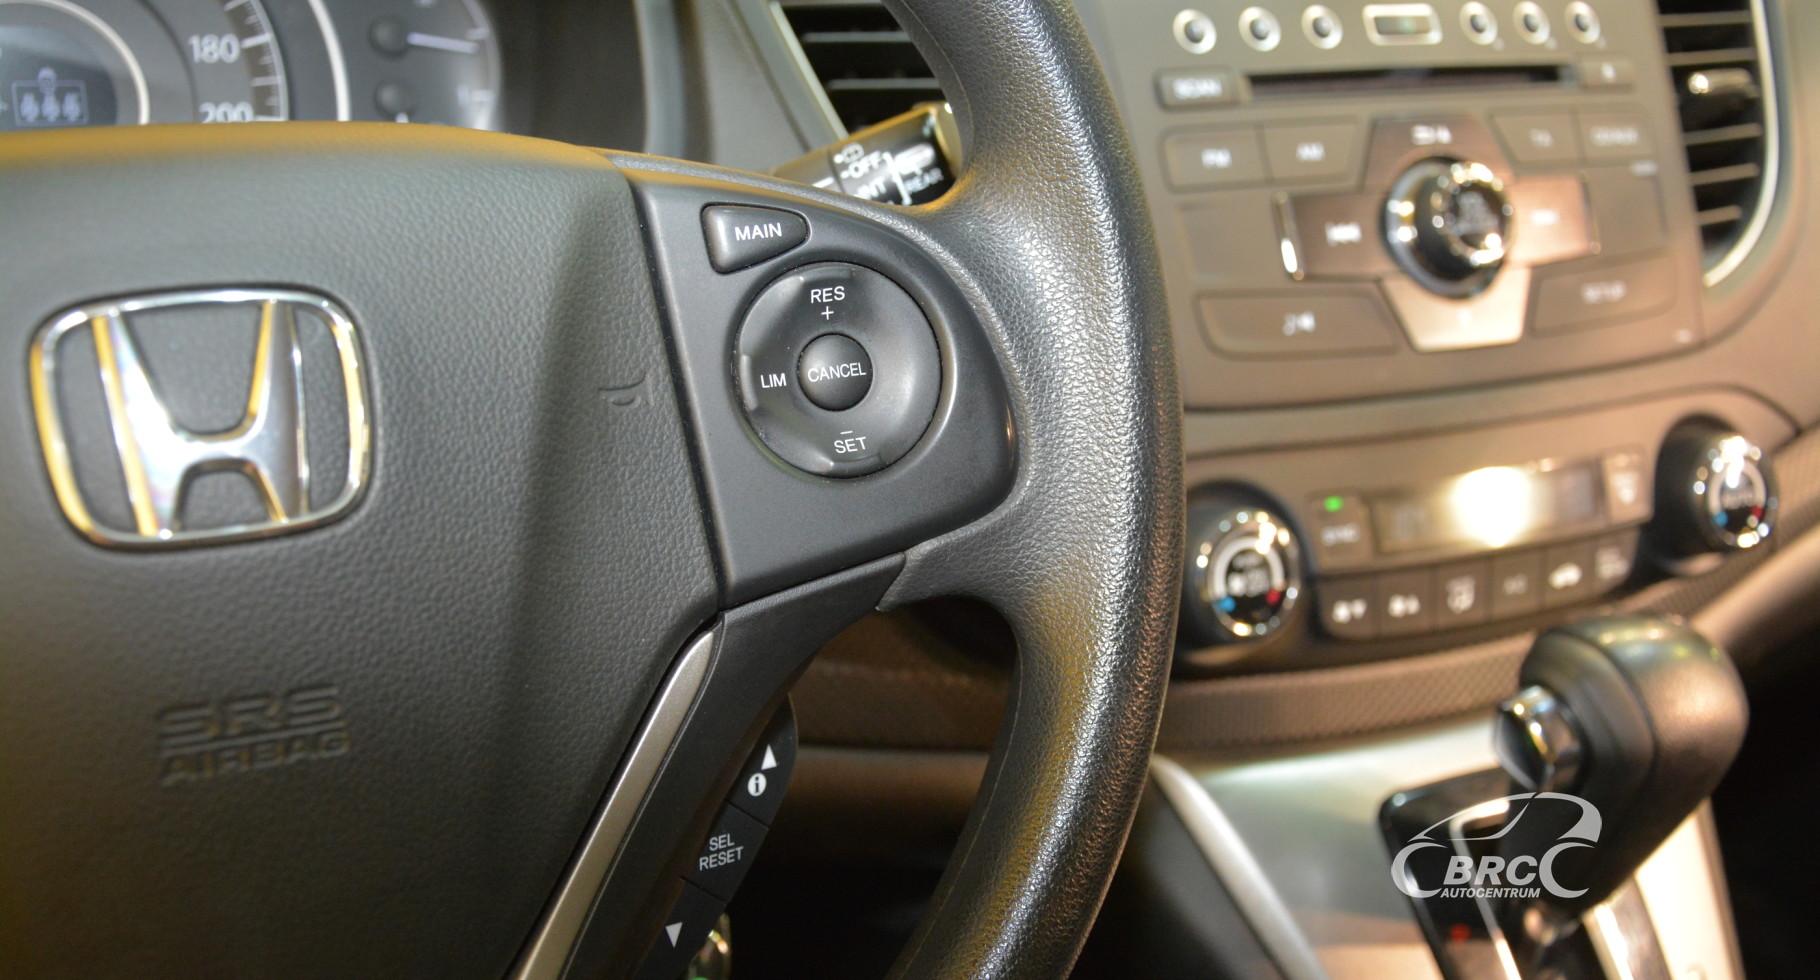 Honda CR-V 2 2 i-DTEC Automatas (ID: 804475) | BRC Autocentrum